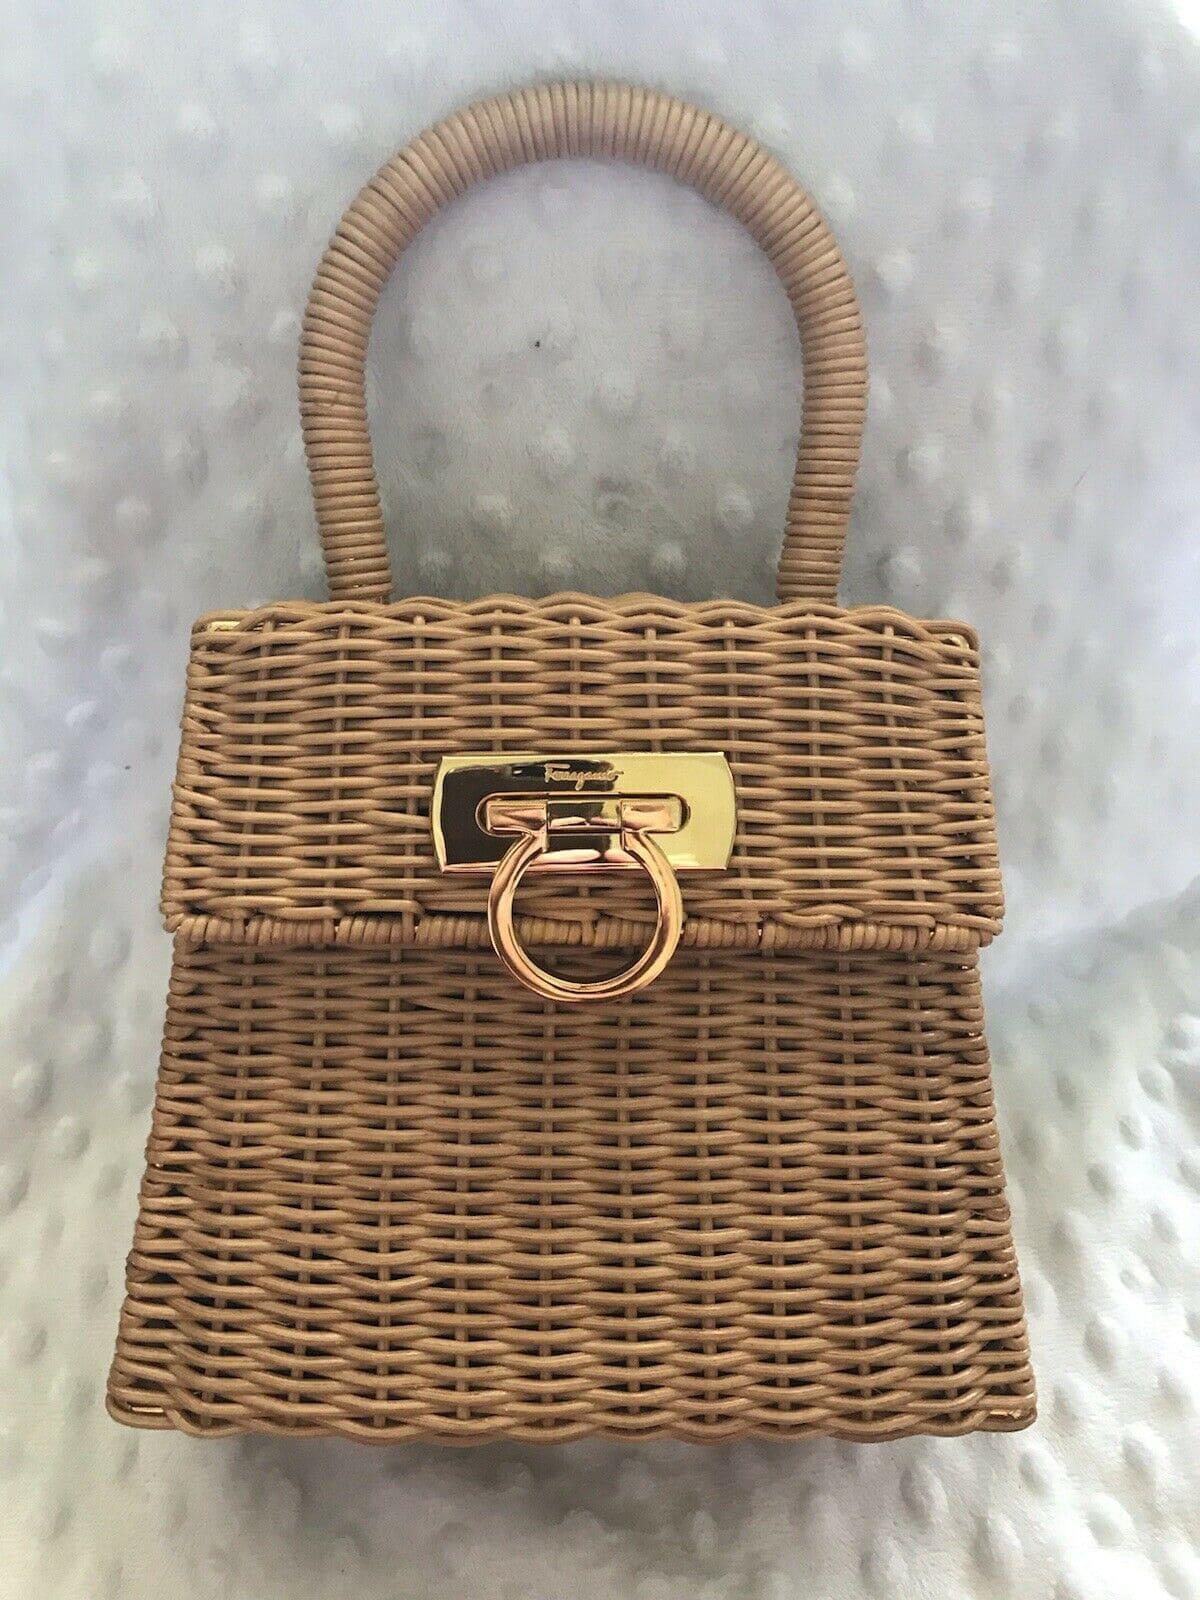 Salvatore Ferragamo Gancini Straw Hand Tote Bag Brown Vintage DO-216176